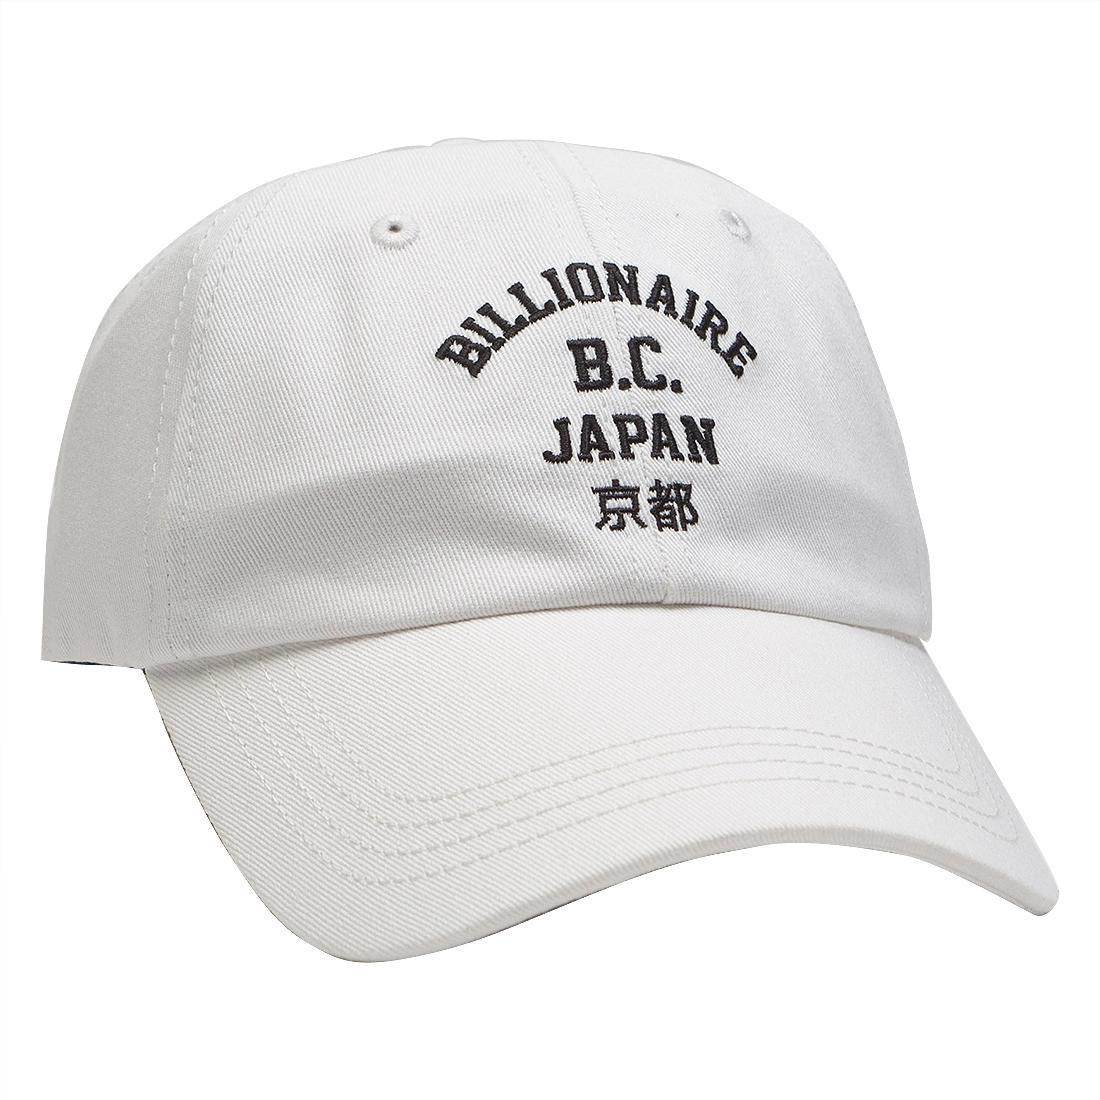 Billionaire Boys Club Japan Road Cap (white)